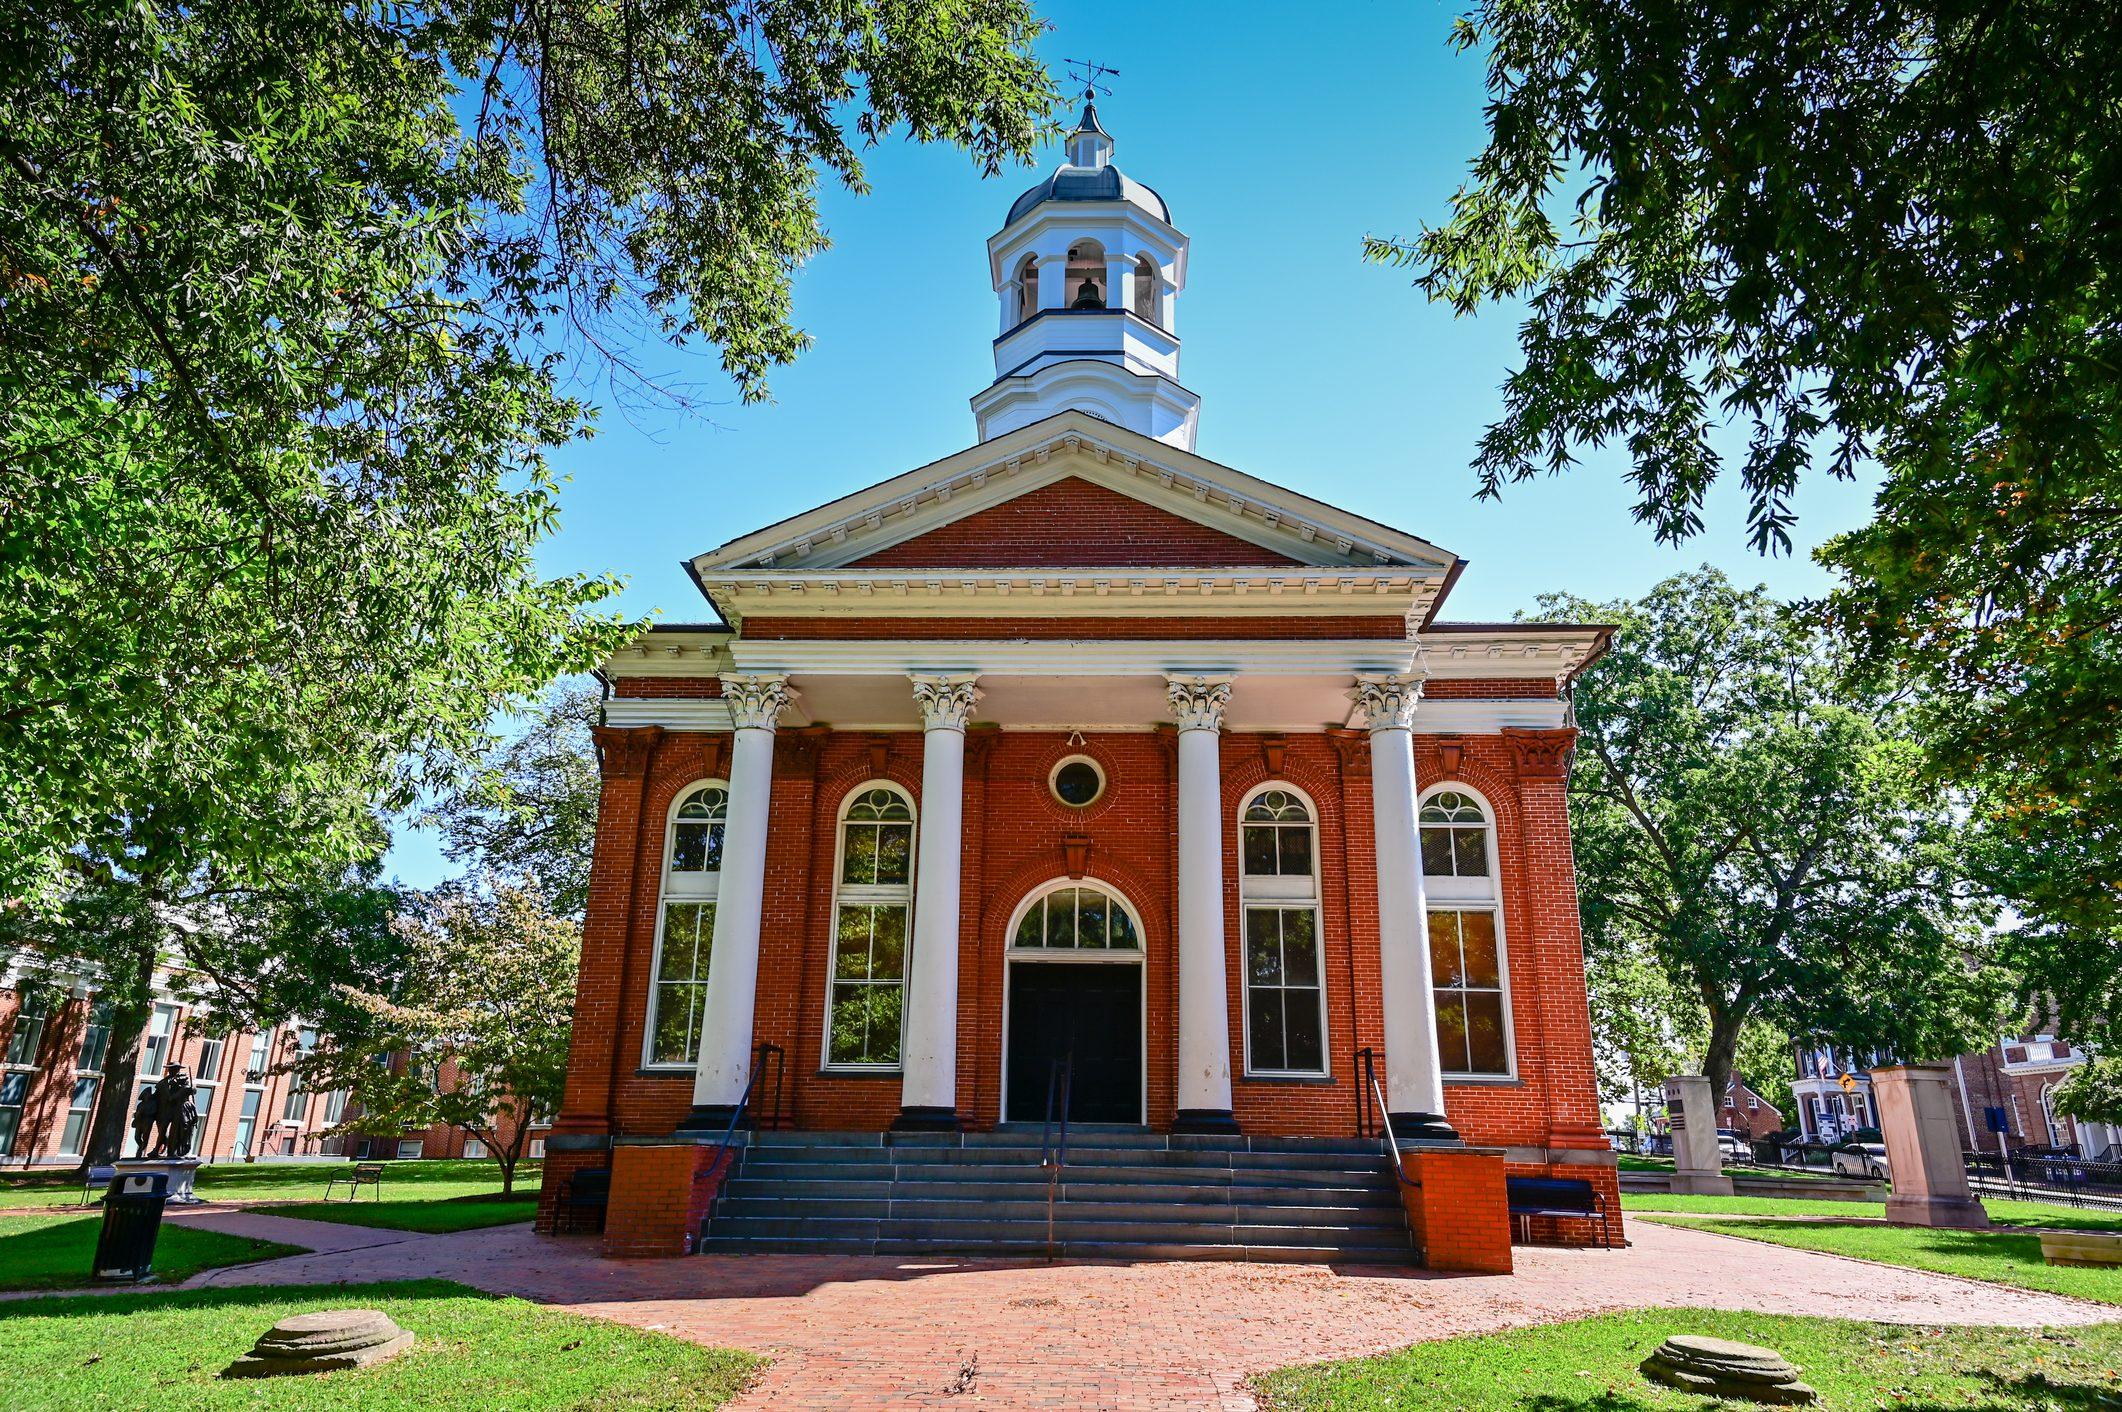 Historic Loudoun County Courthouse Leesburg VA